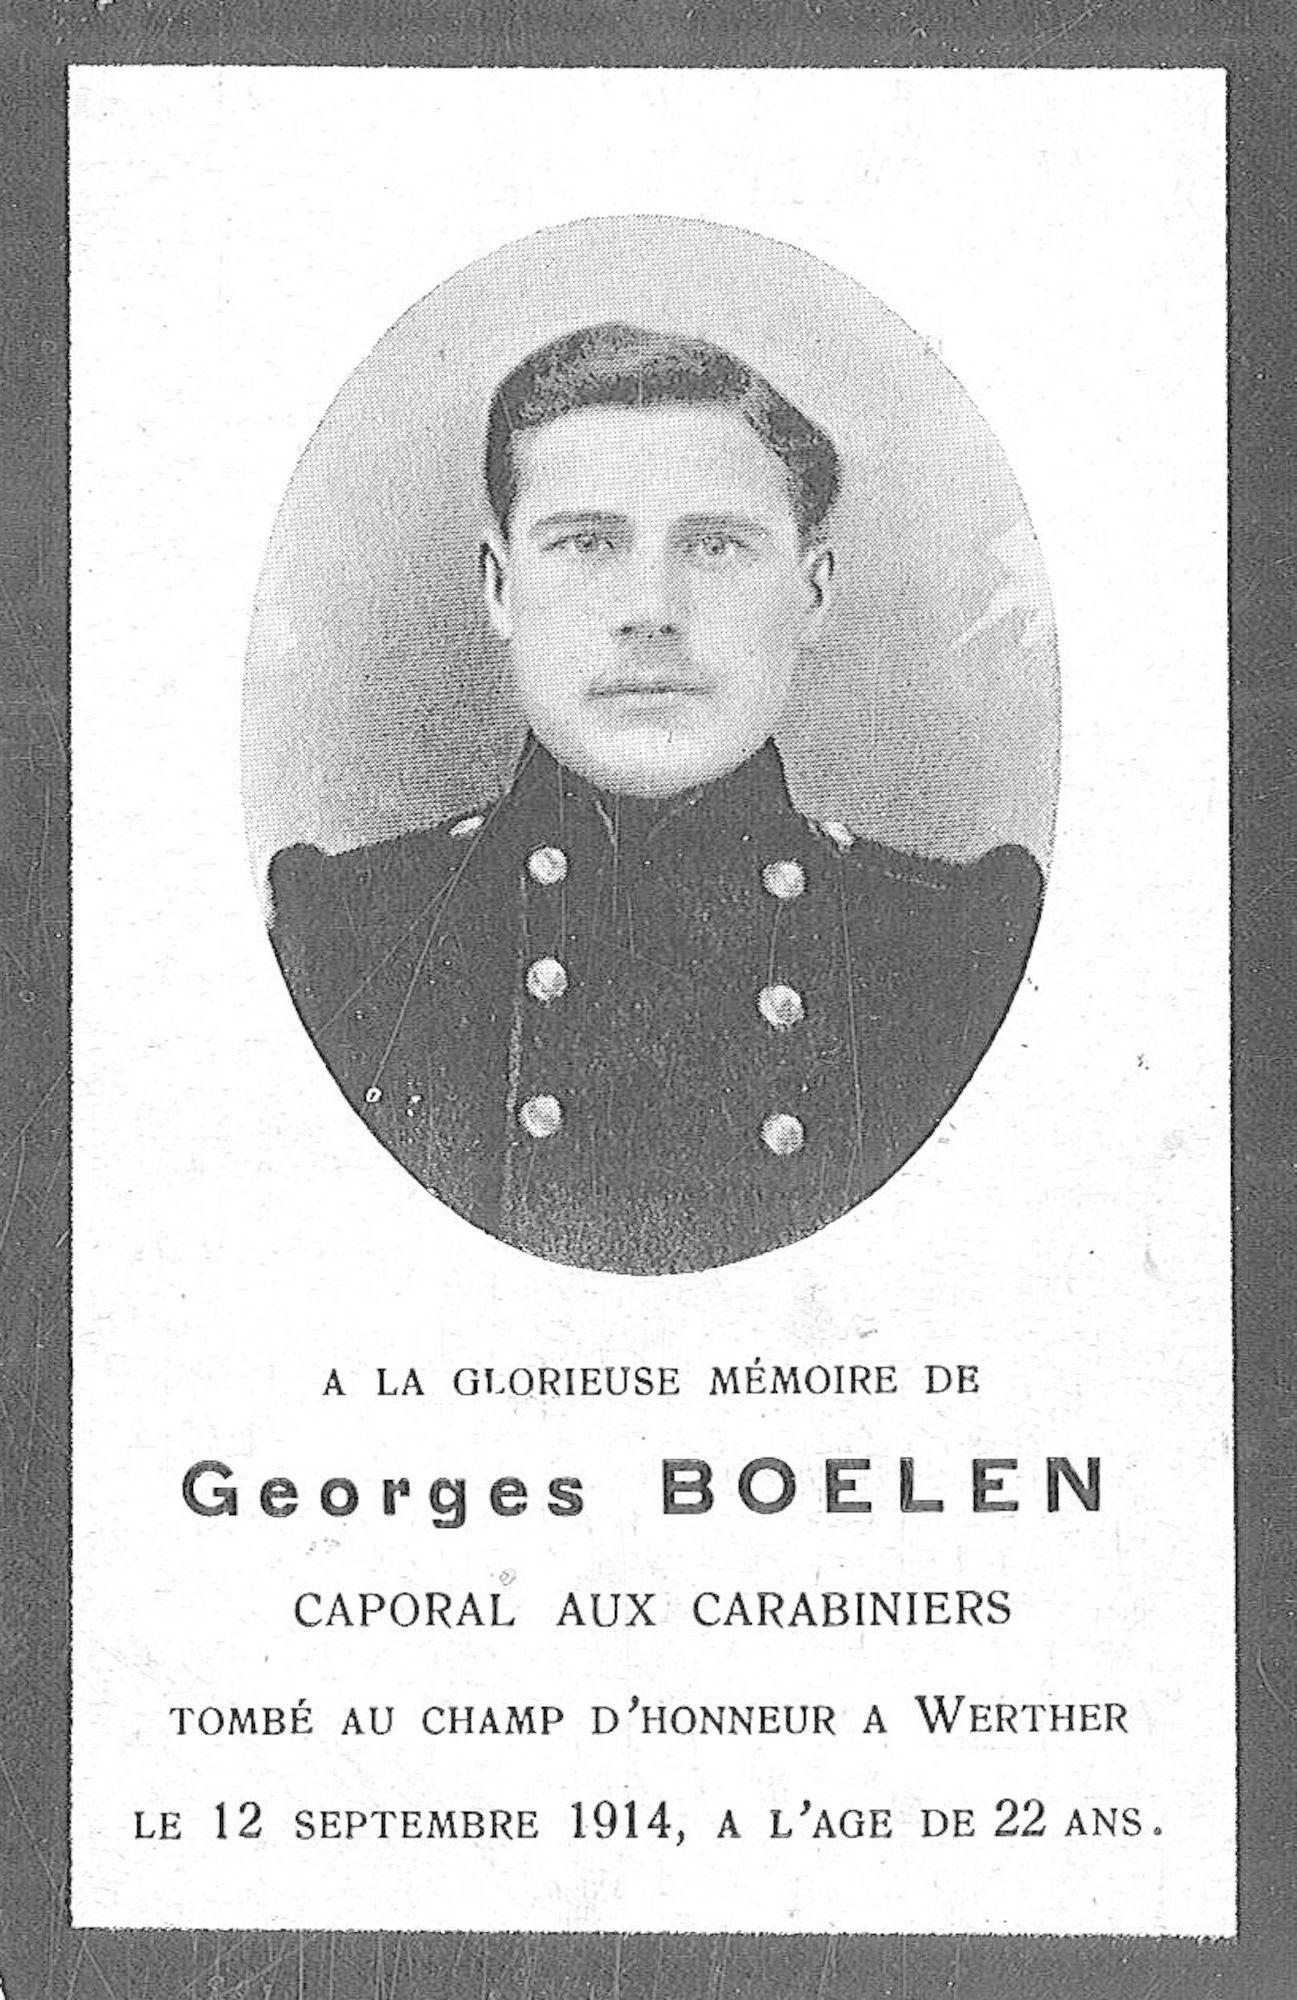 Georges Boelen